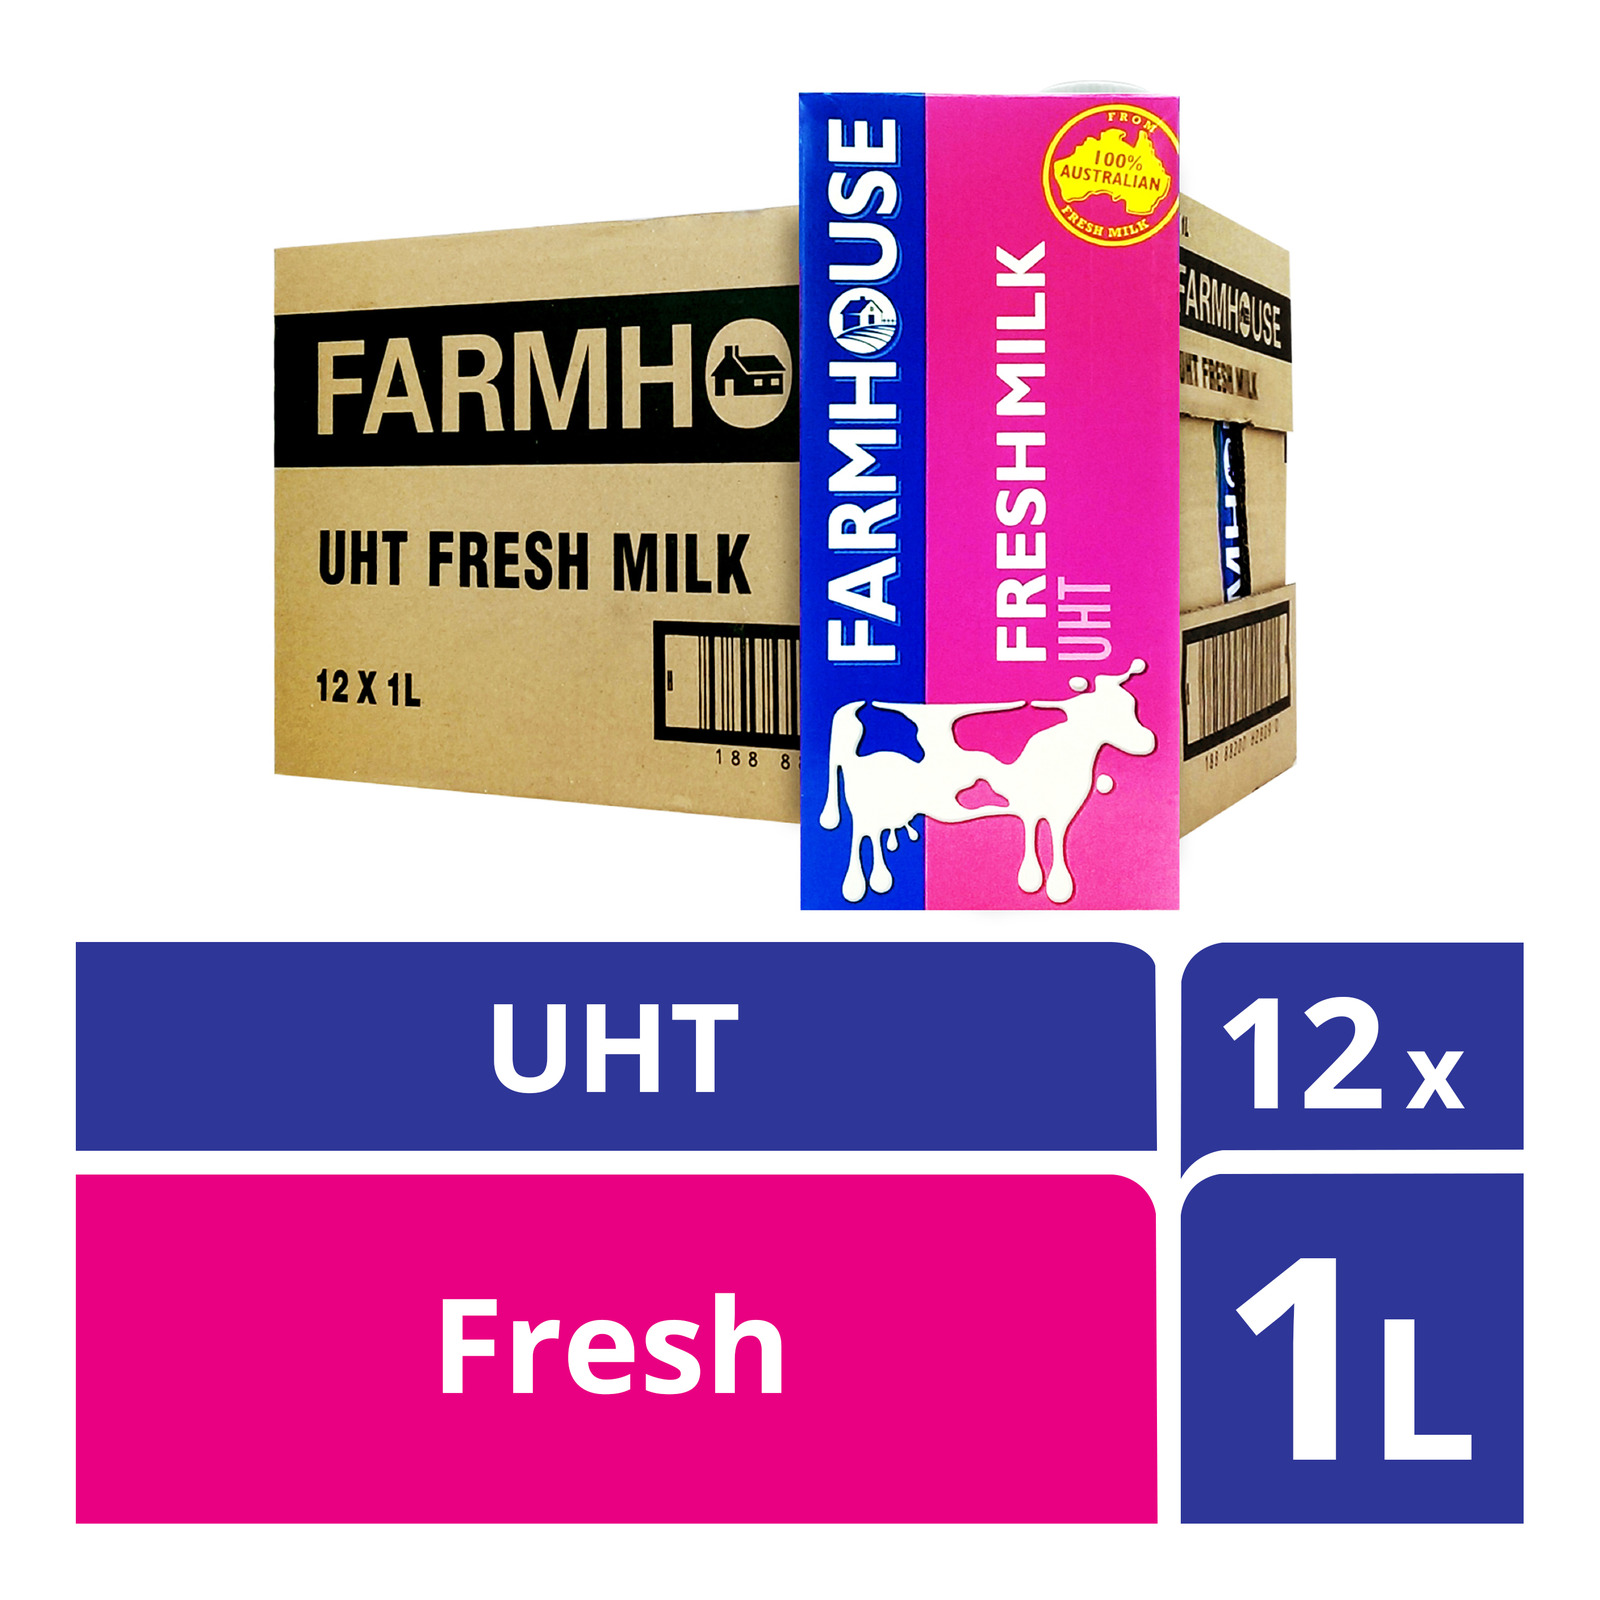 Farmhouse UHT Milk - Fresh